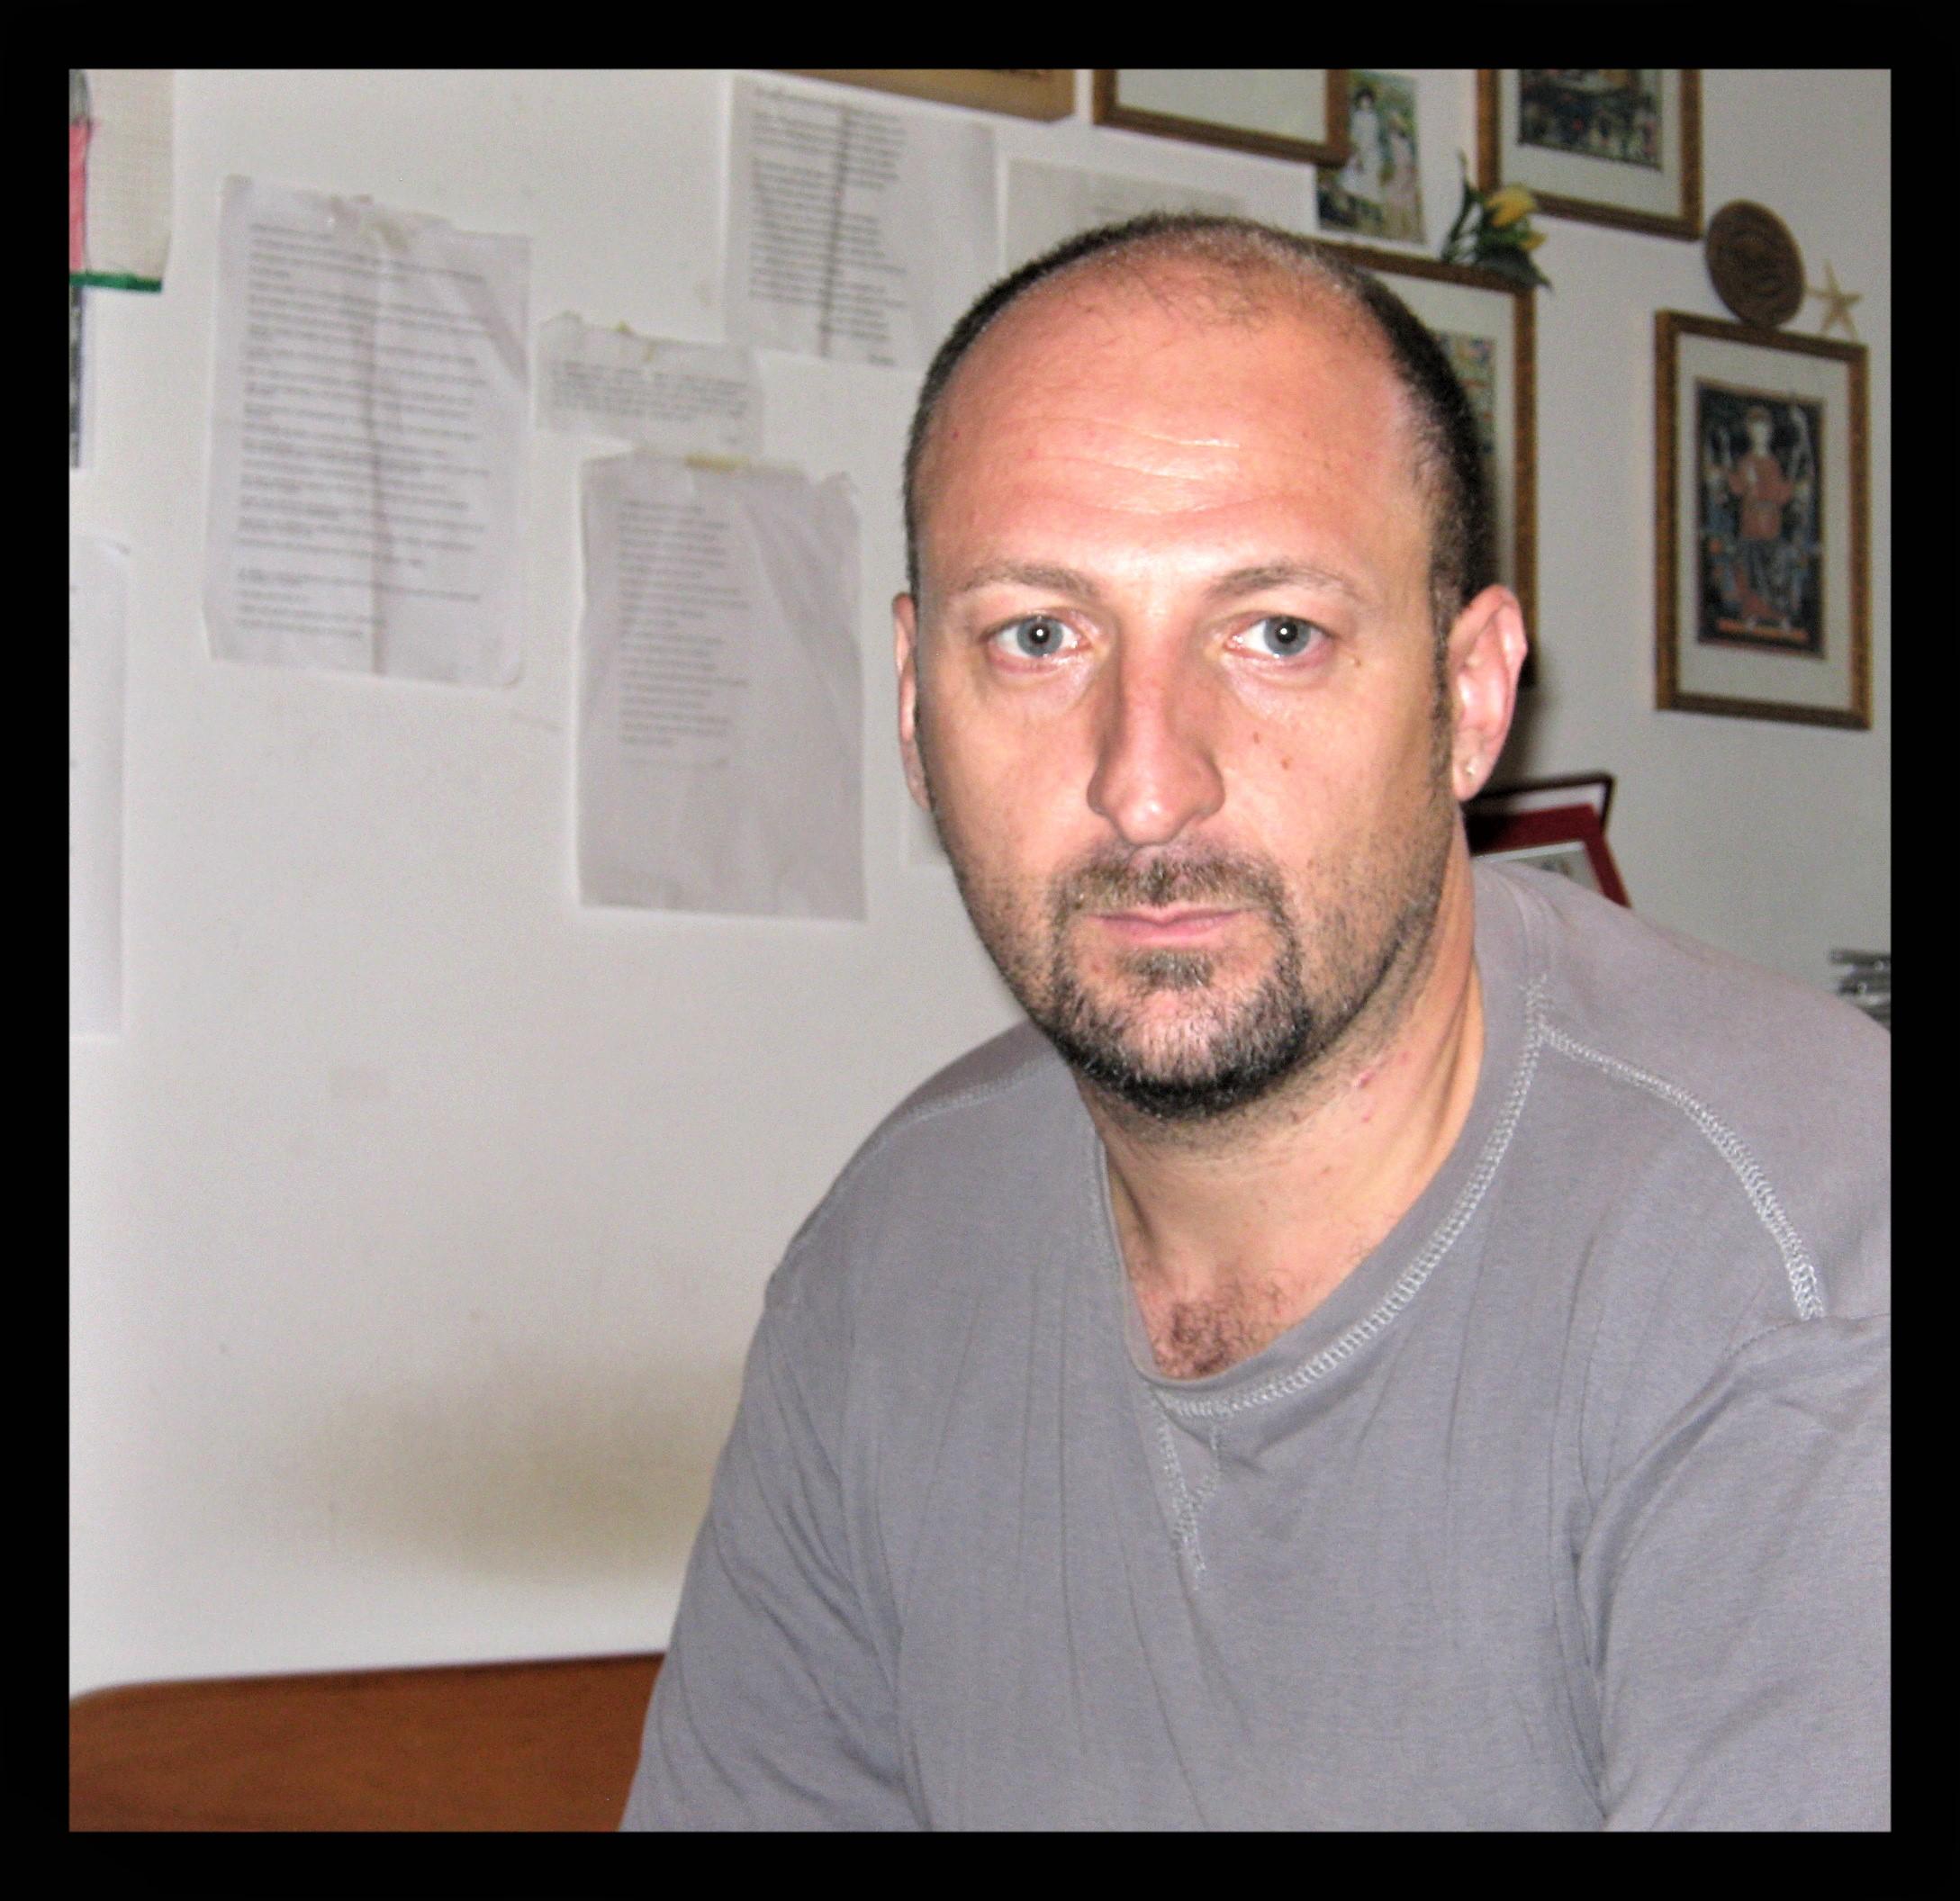 gianni + '-' + marcantoni-prospero-editore